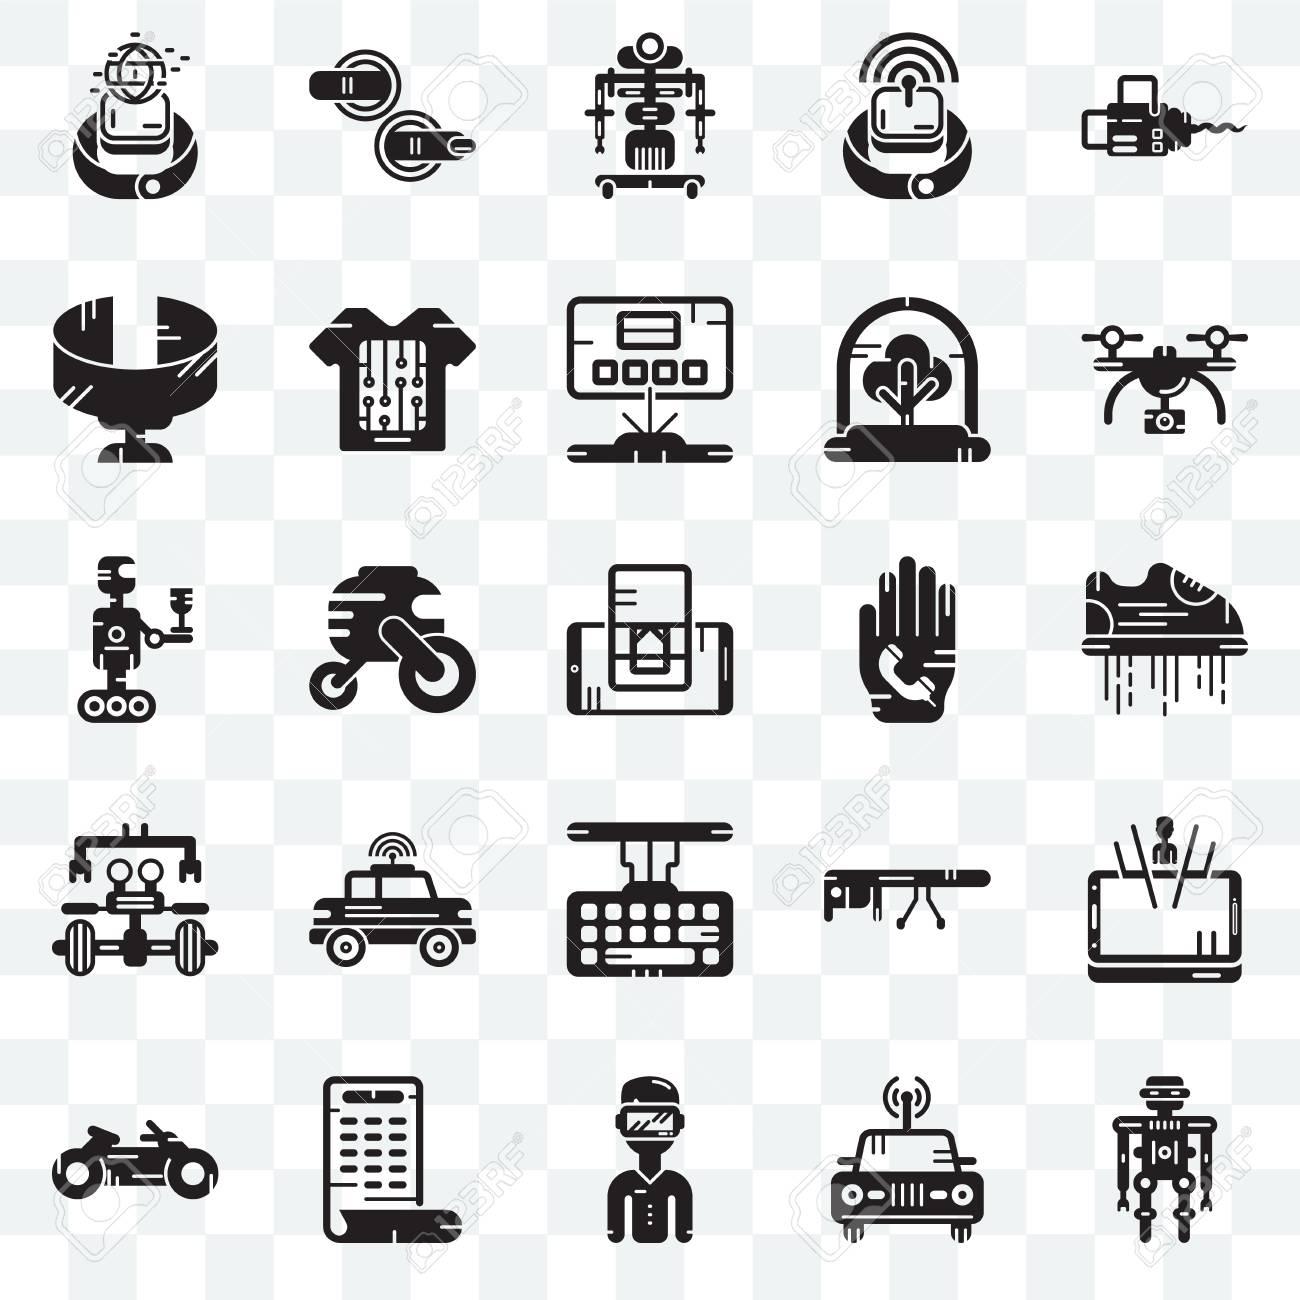 Set Of 25 transparent icons such as Robot, Car, Smartphone, Motorbike,